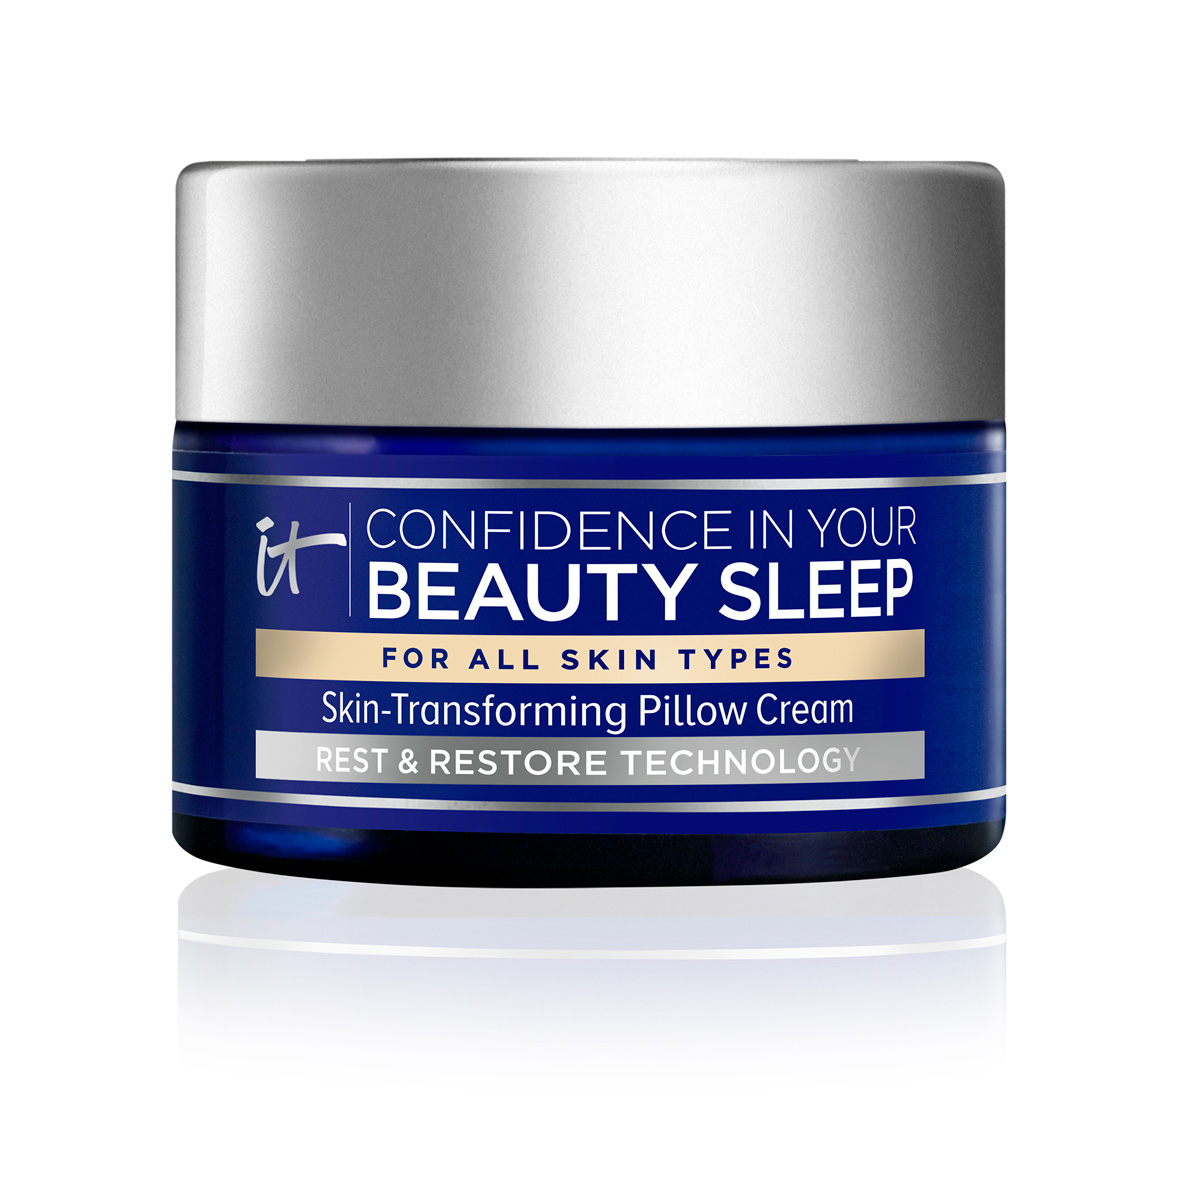 CONFIDENCE IN YOUR BEAUTY SLEEP 14ML (CREMA HIDRATANTE DE NOCHE)